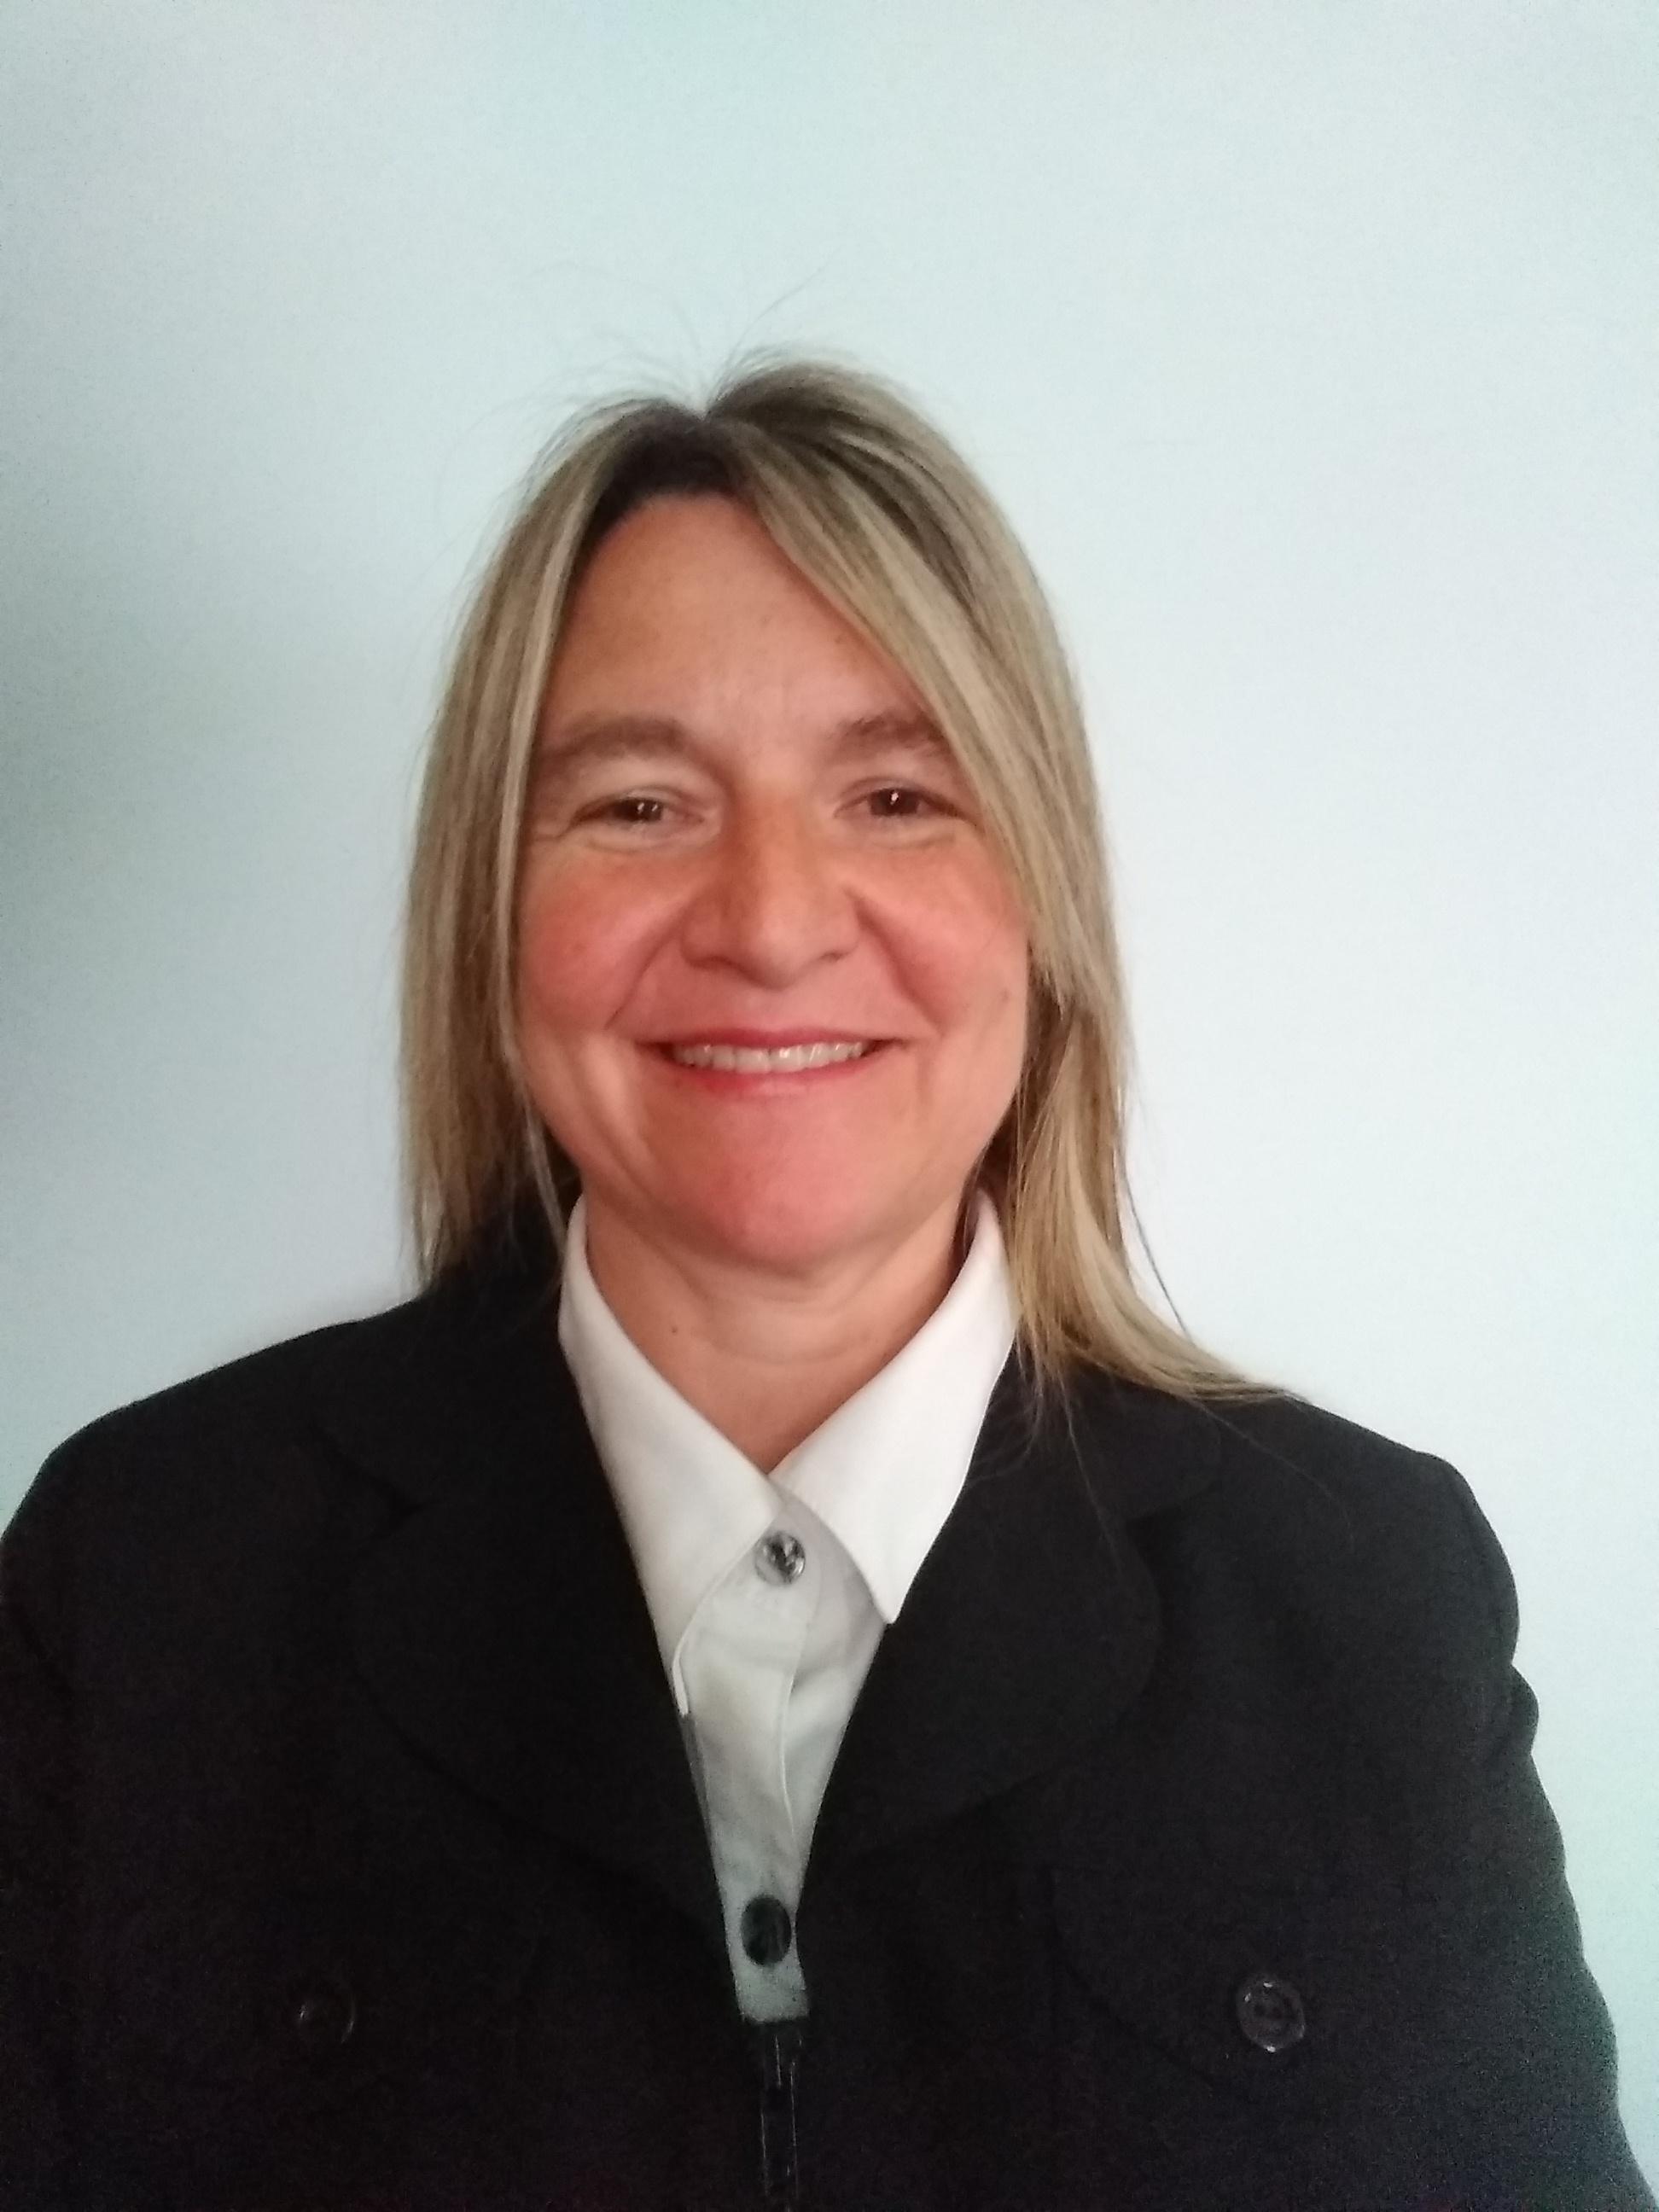 Melissa Rueff